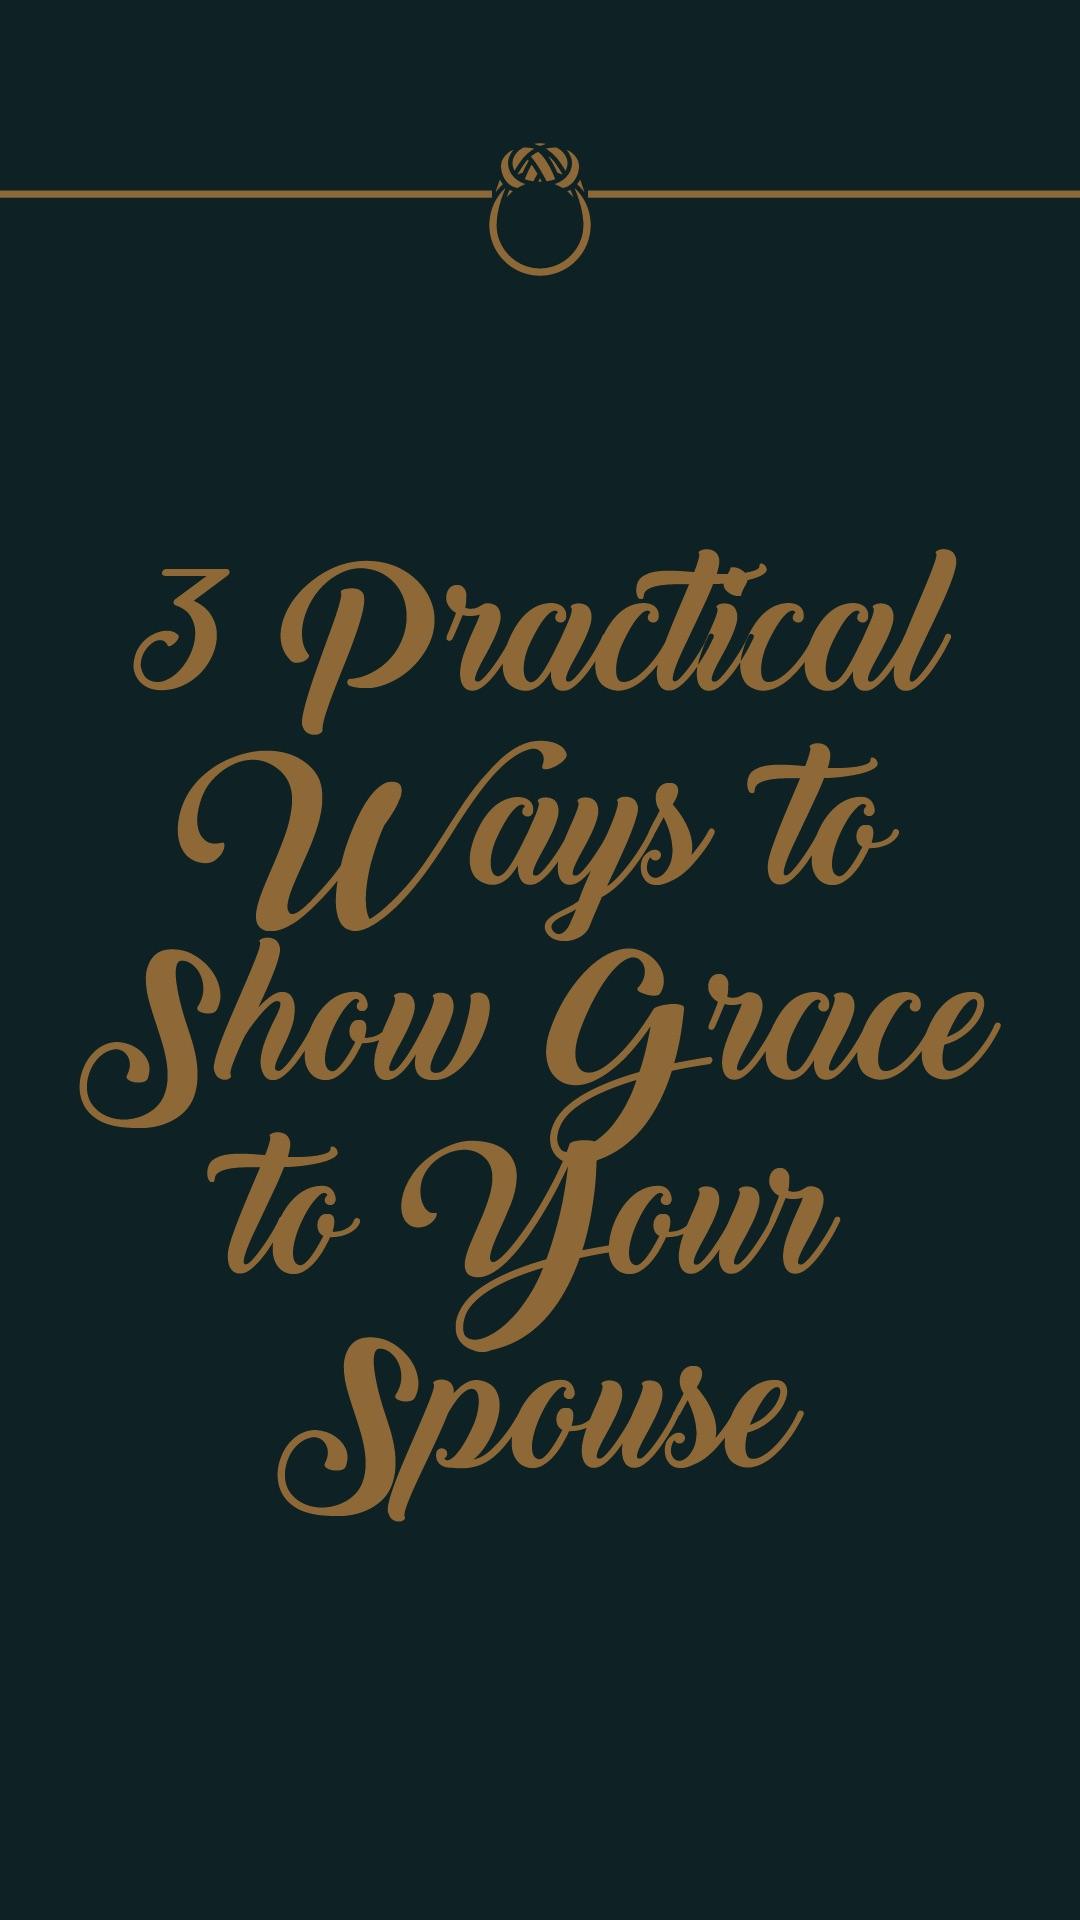 Practical Ways 1 (PNG)